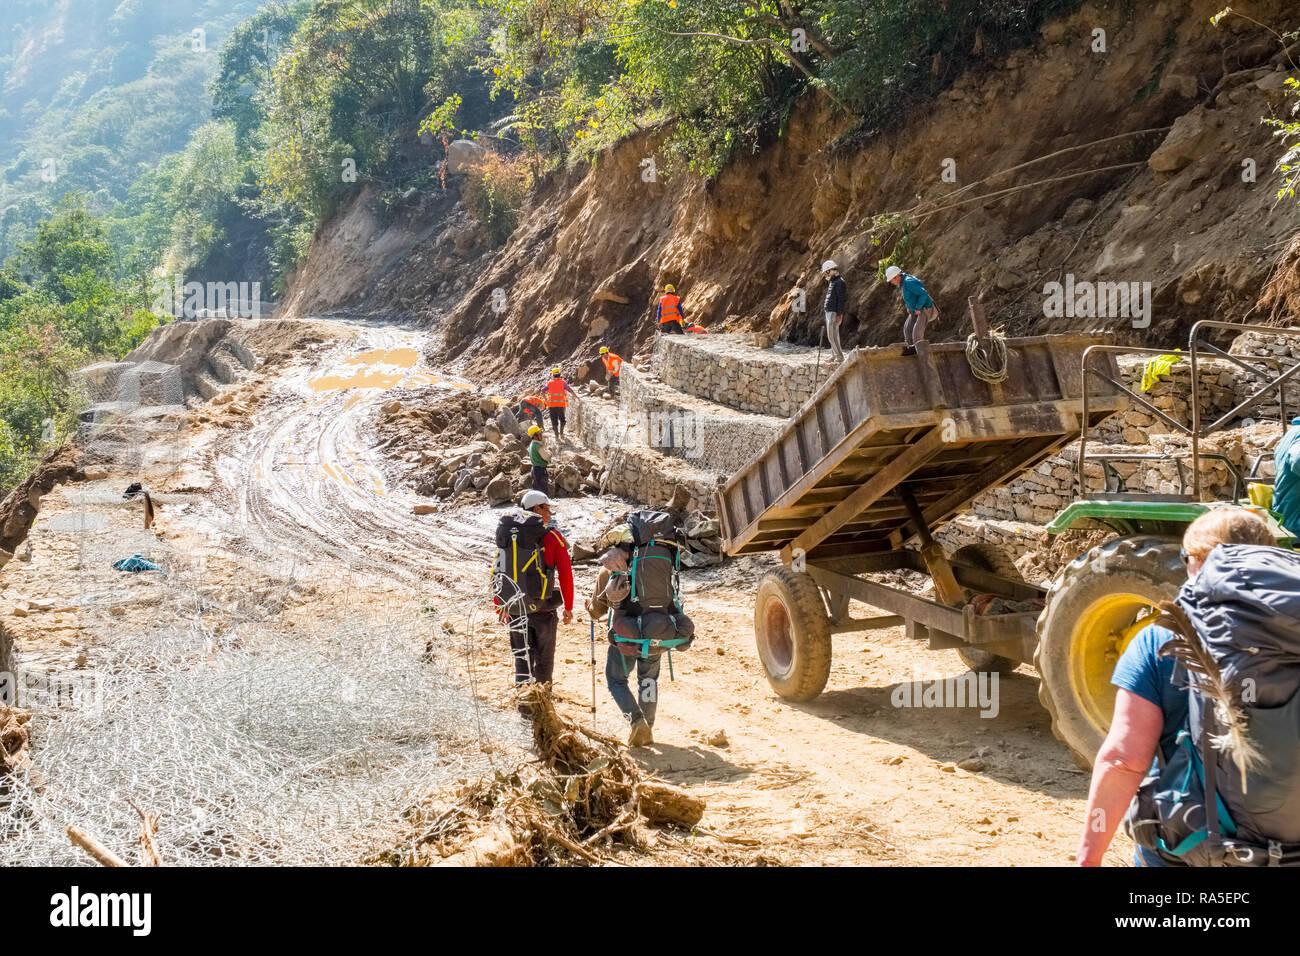 Trekkers walking through road construction work on the Annapurna Circuit trek, Nepal - Stock Image